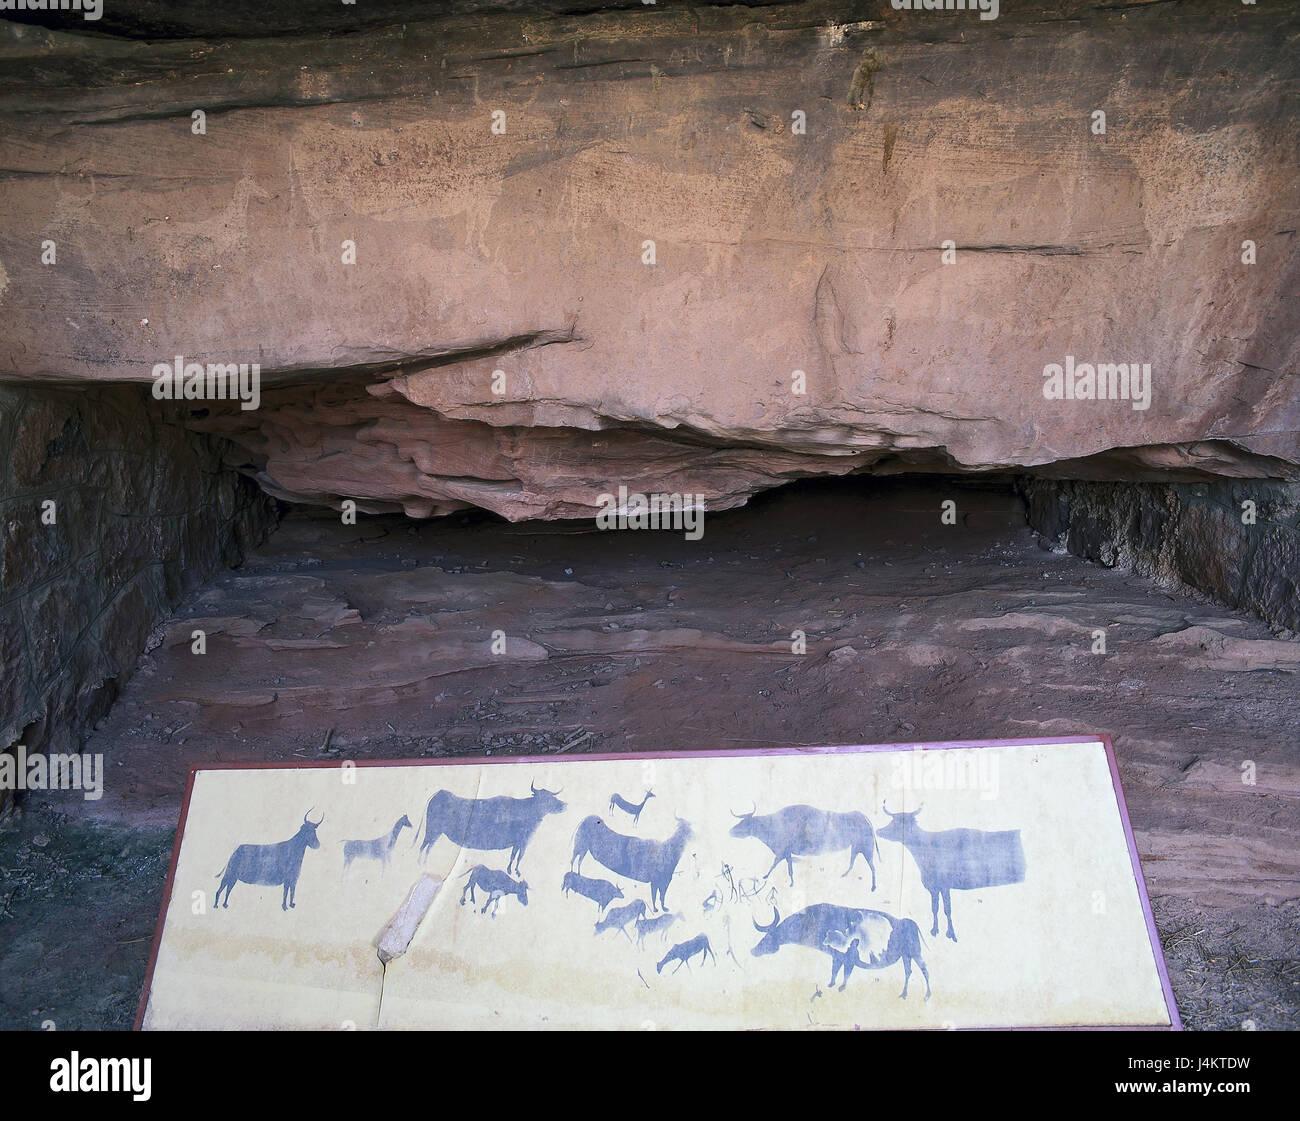 Spain, Aragon, province of Teruel, Albarracin, prehistoric mural painting outside, area, Mediterranean Basin, prehistorically, - Stock Image